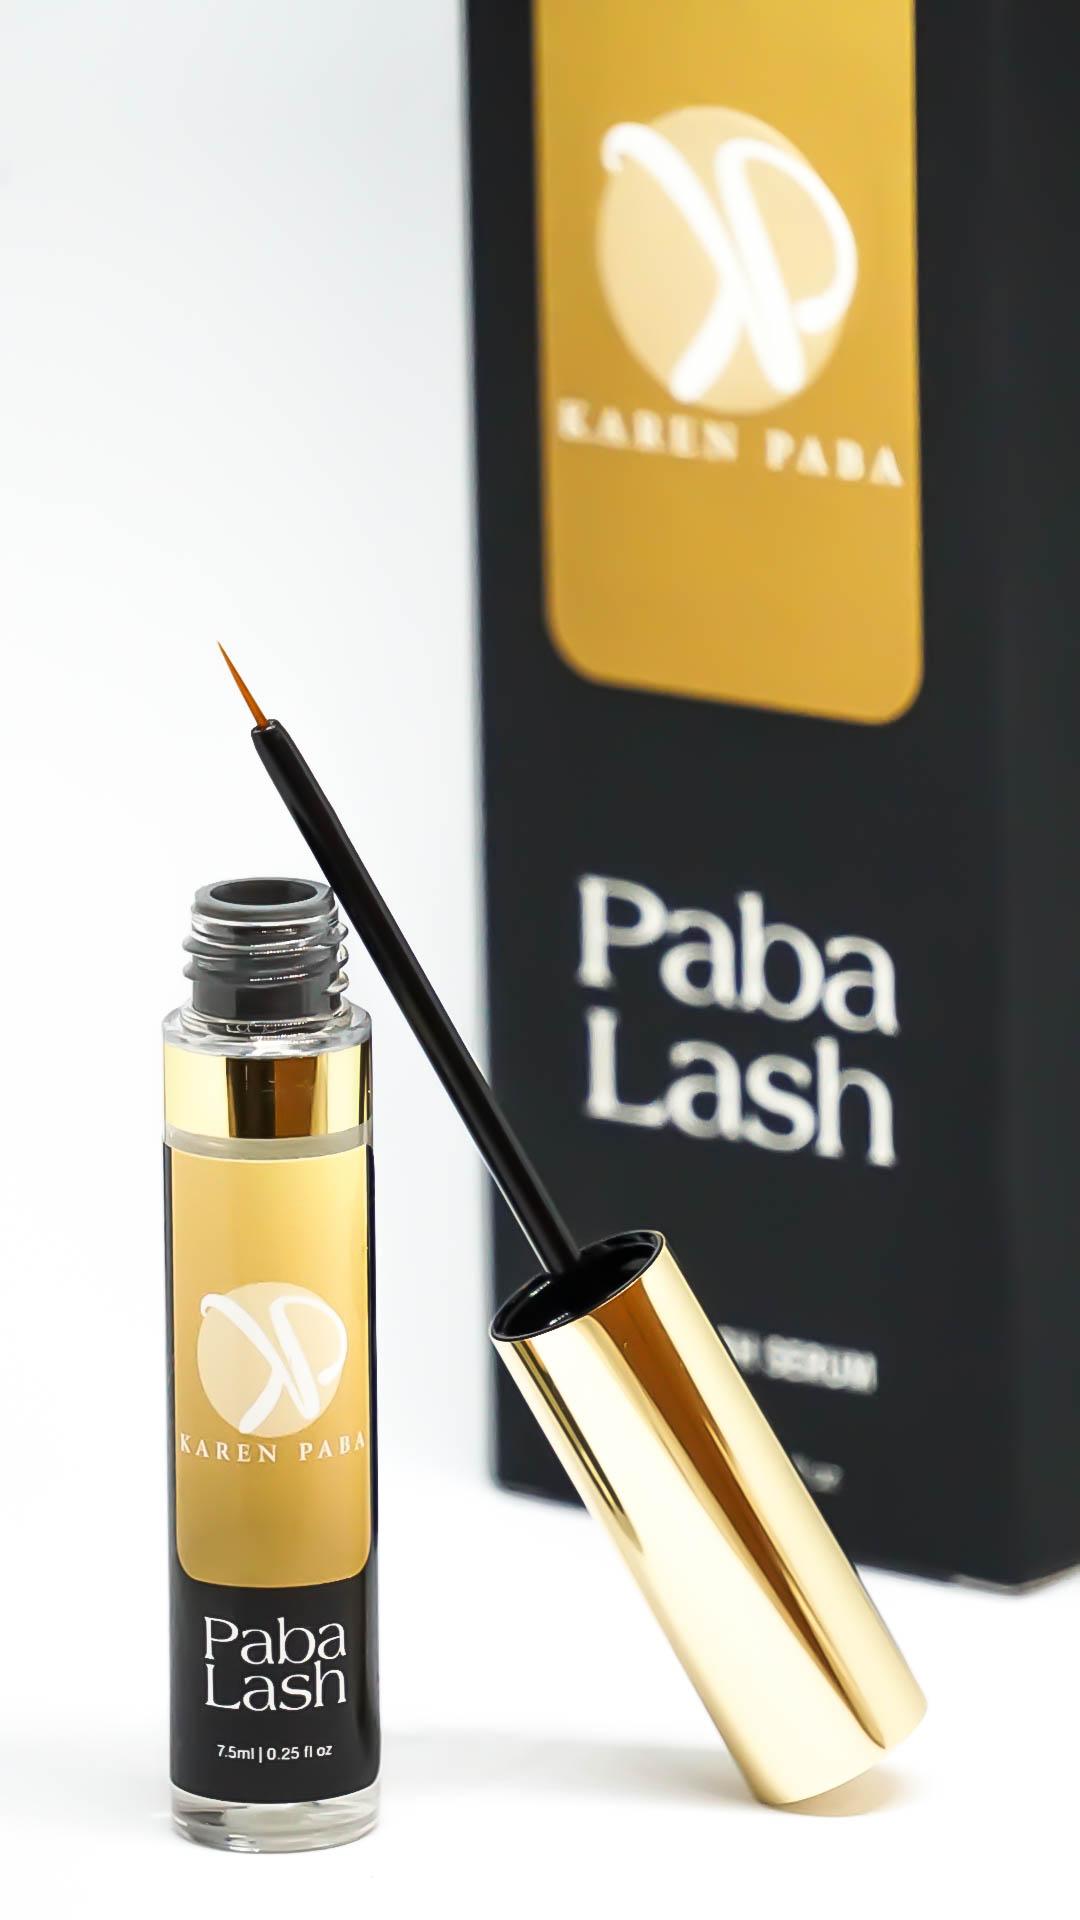 Paba Lash, Karen Paba, pestanas